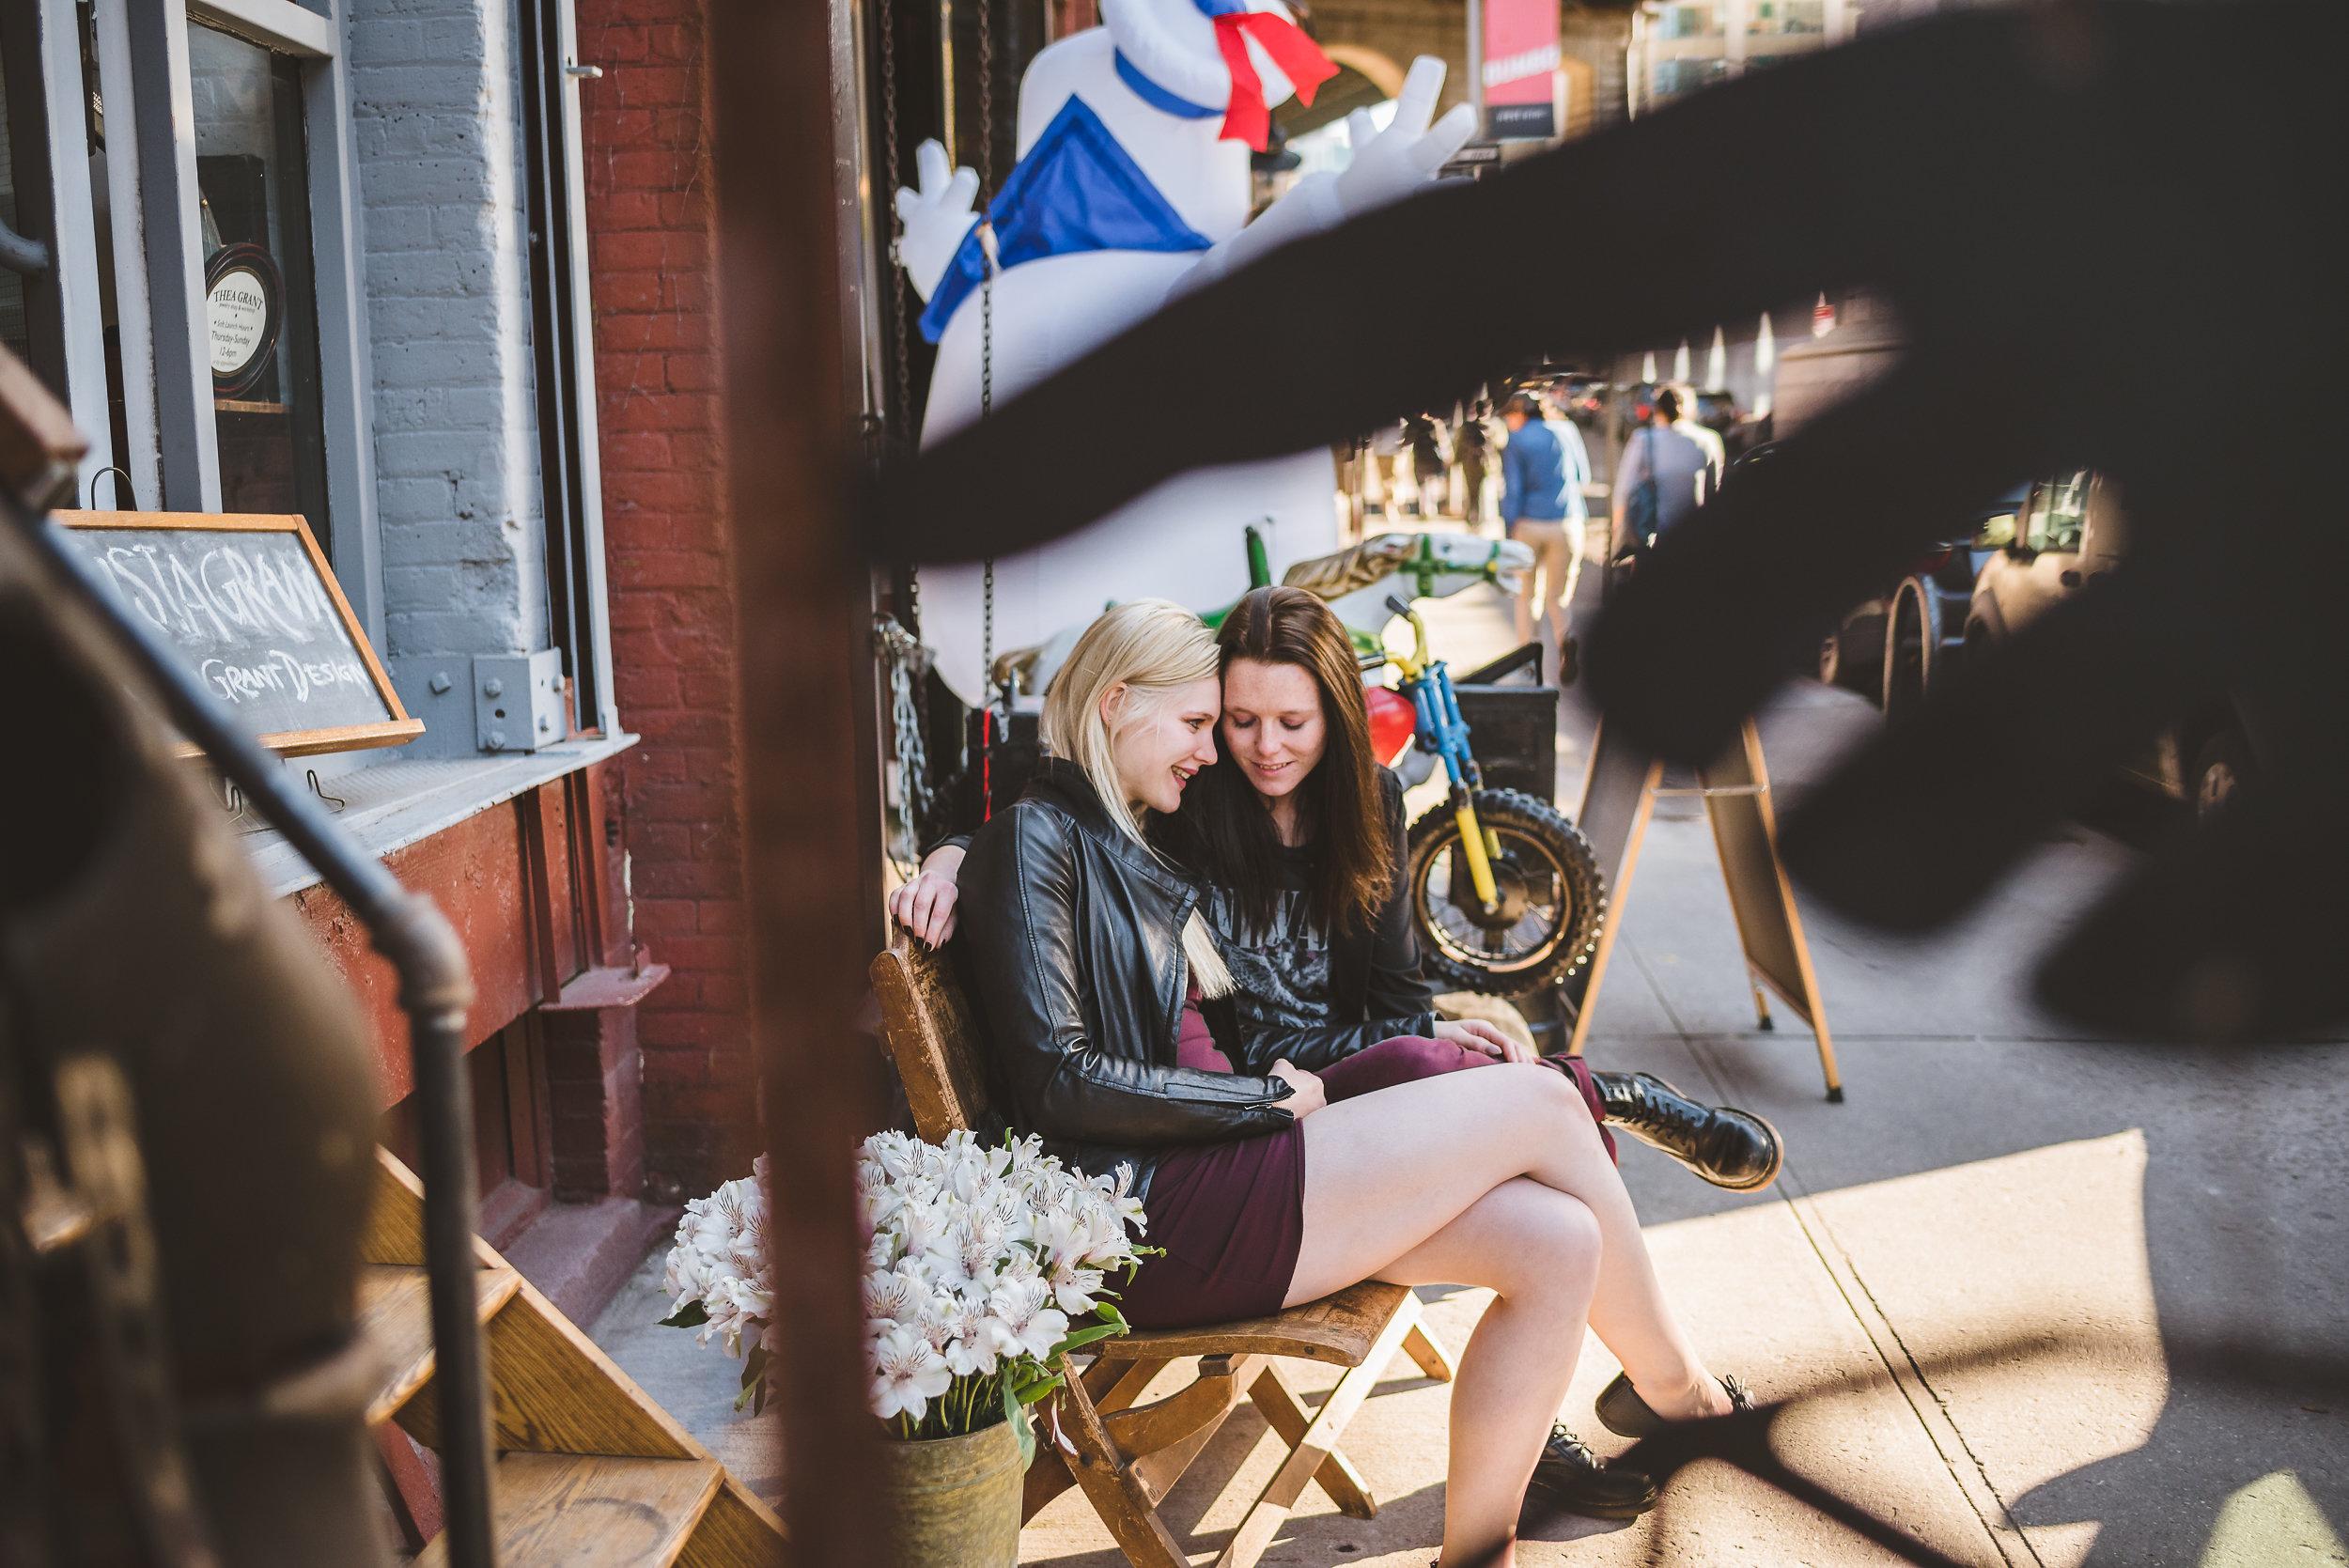 Alexa&Emily Dumbo NYC Couples Session (29).JPG